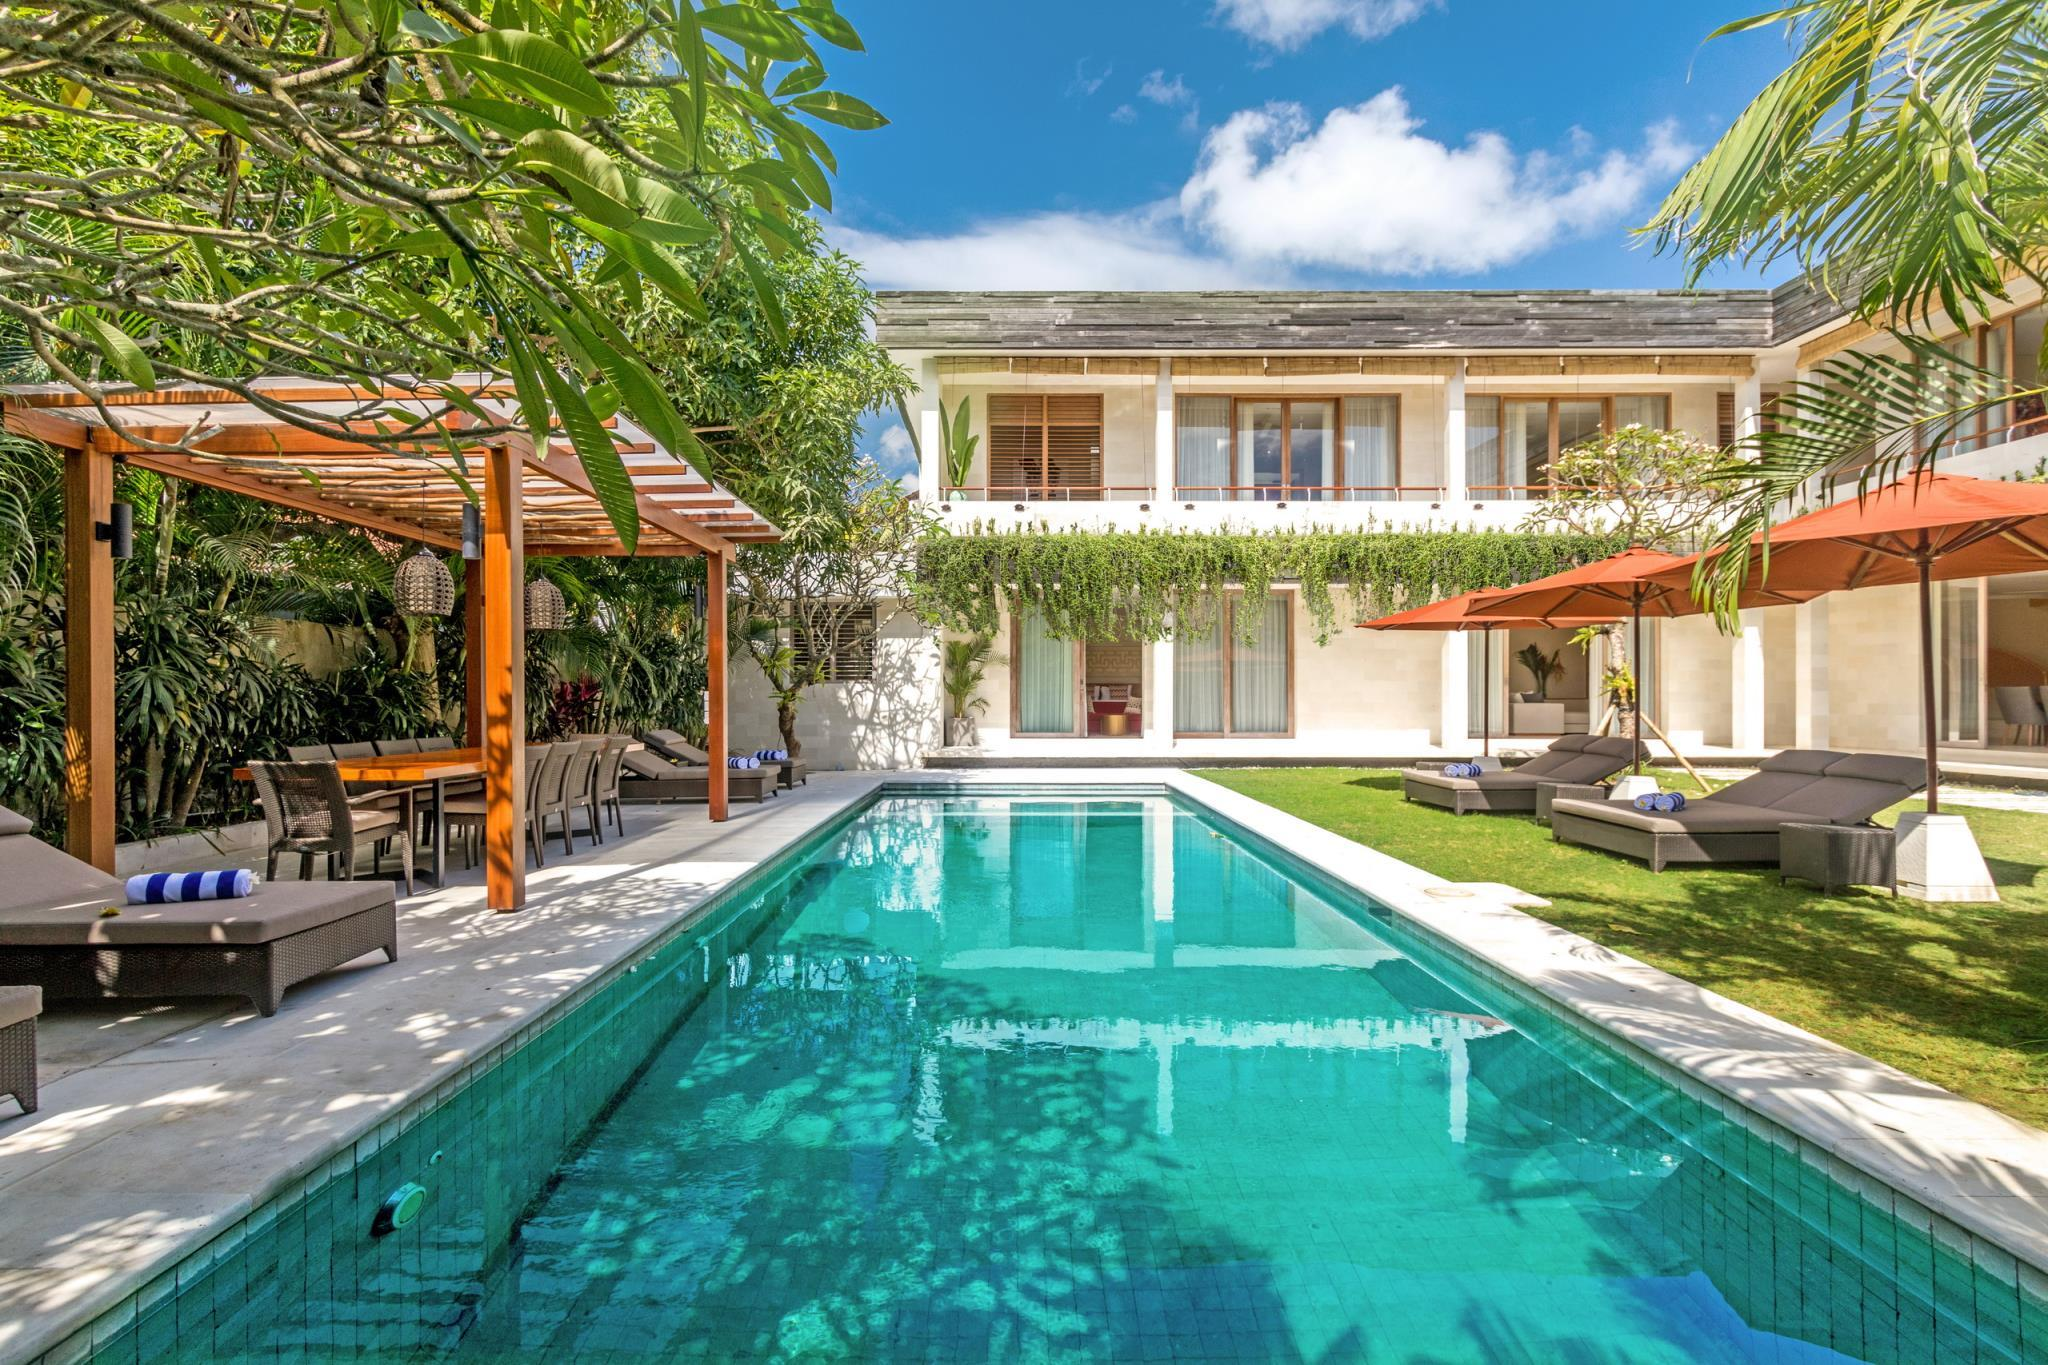 5BR Luxury Jimbaran Villa   Private Pool And Wedding